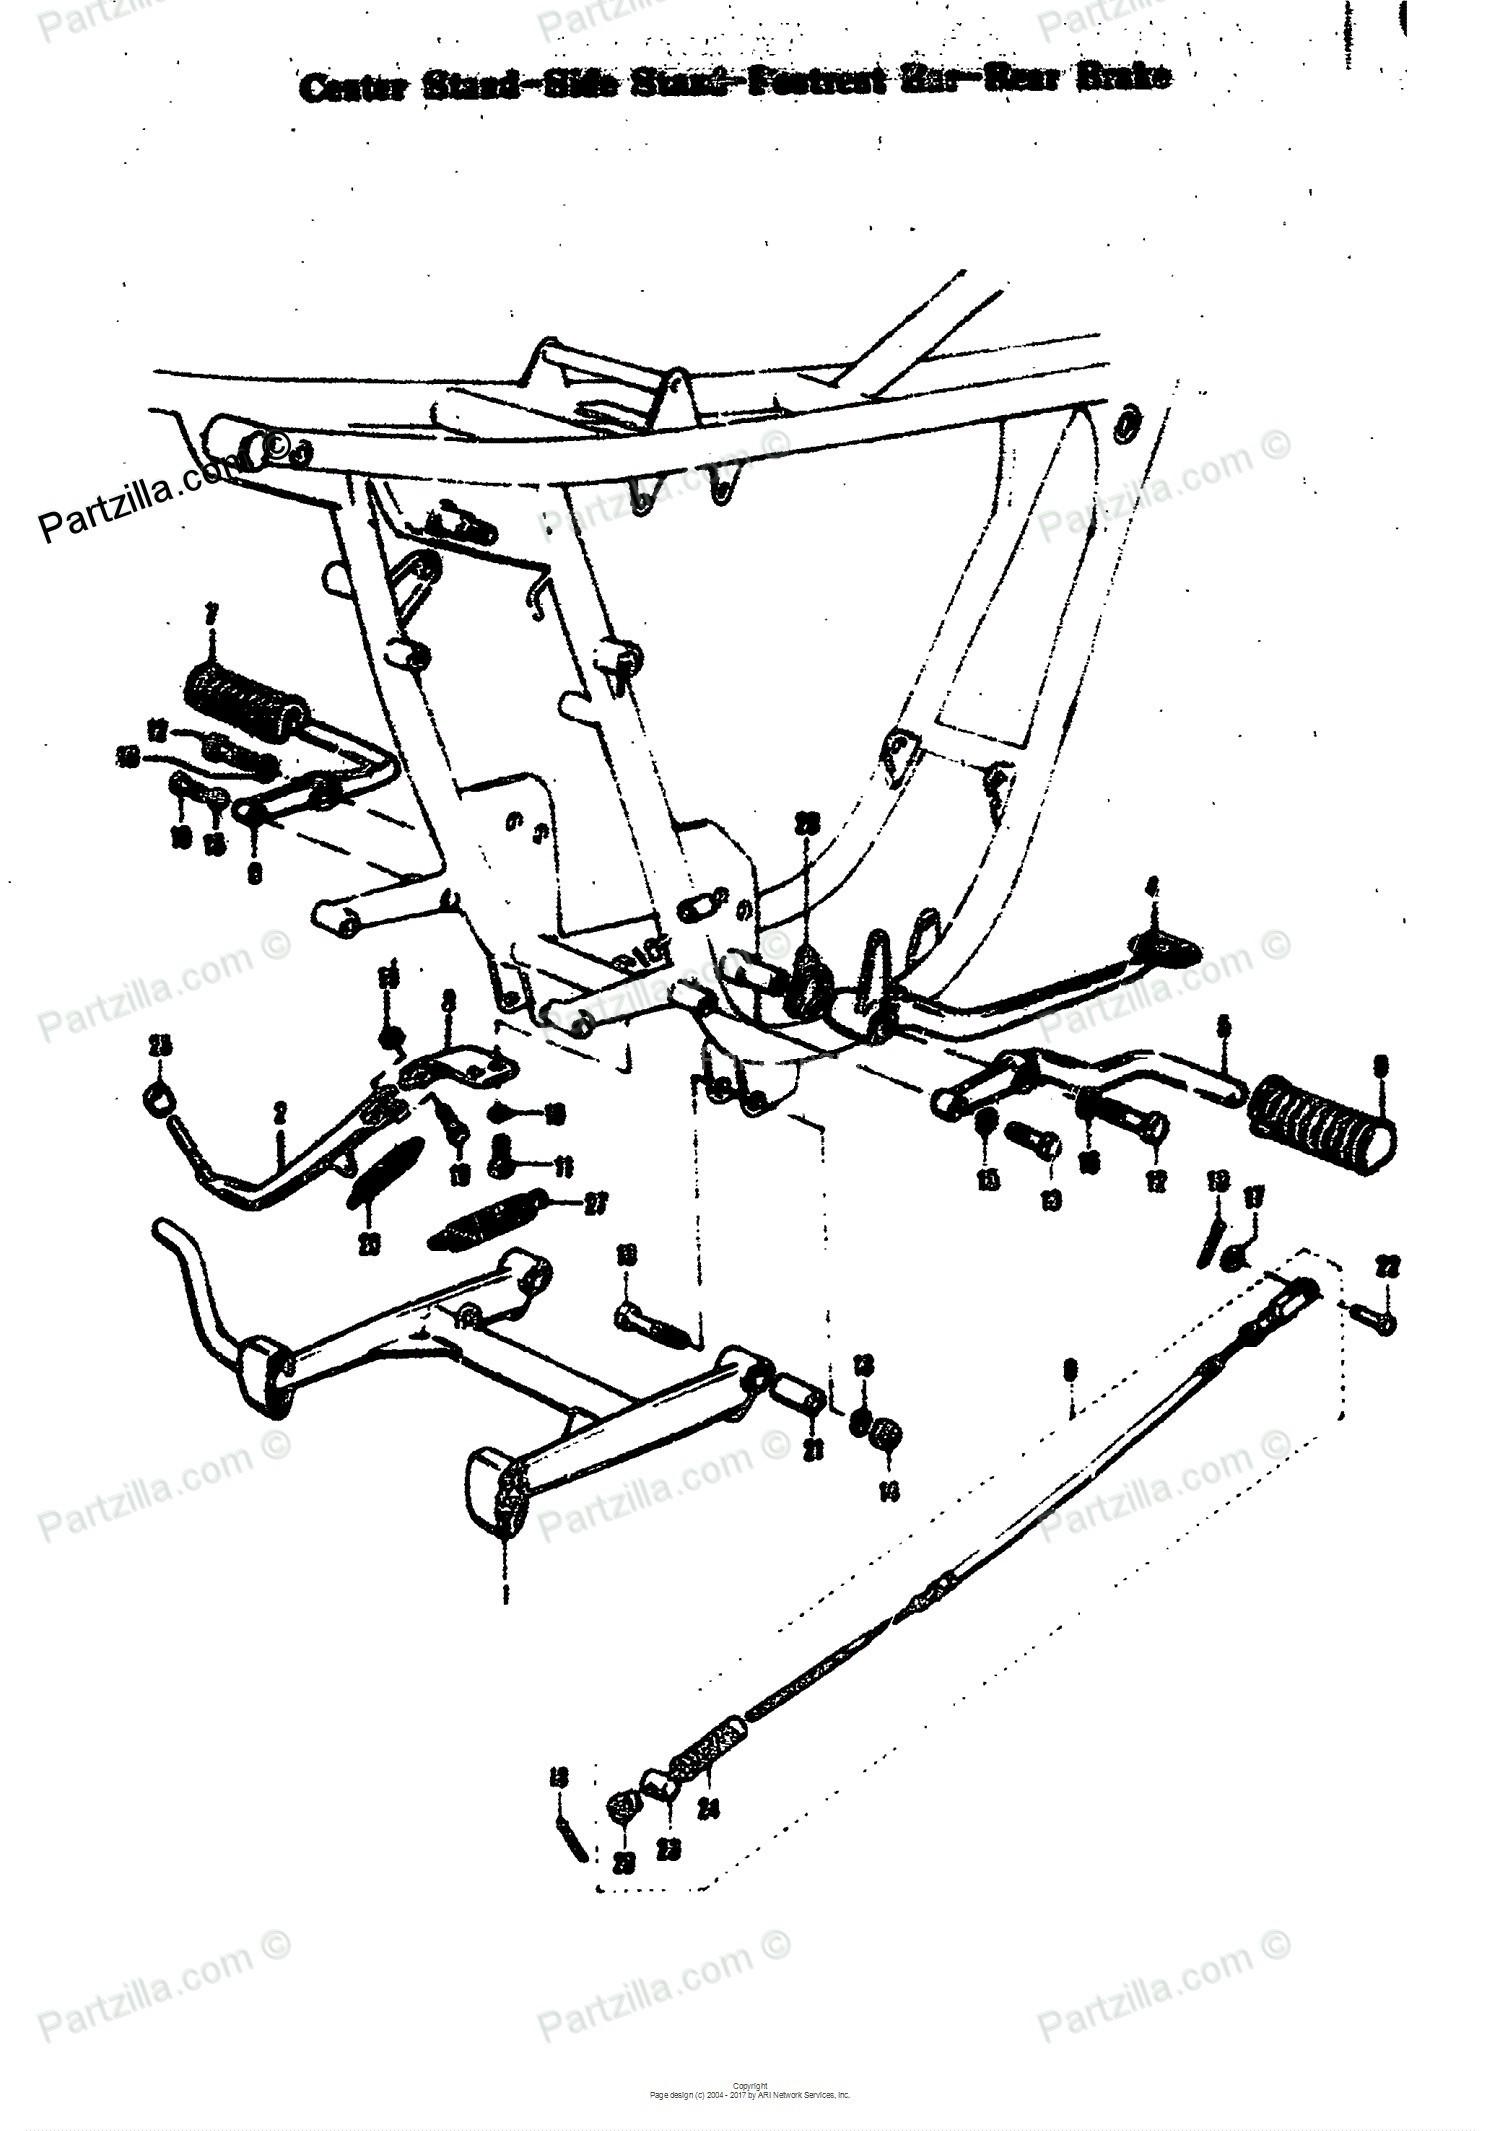 Car suspension diagram ford ranger image rear brake assembly diagram 1997 ford ranger suspension diagram 2004 ford ranger suspension diagram